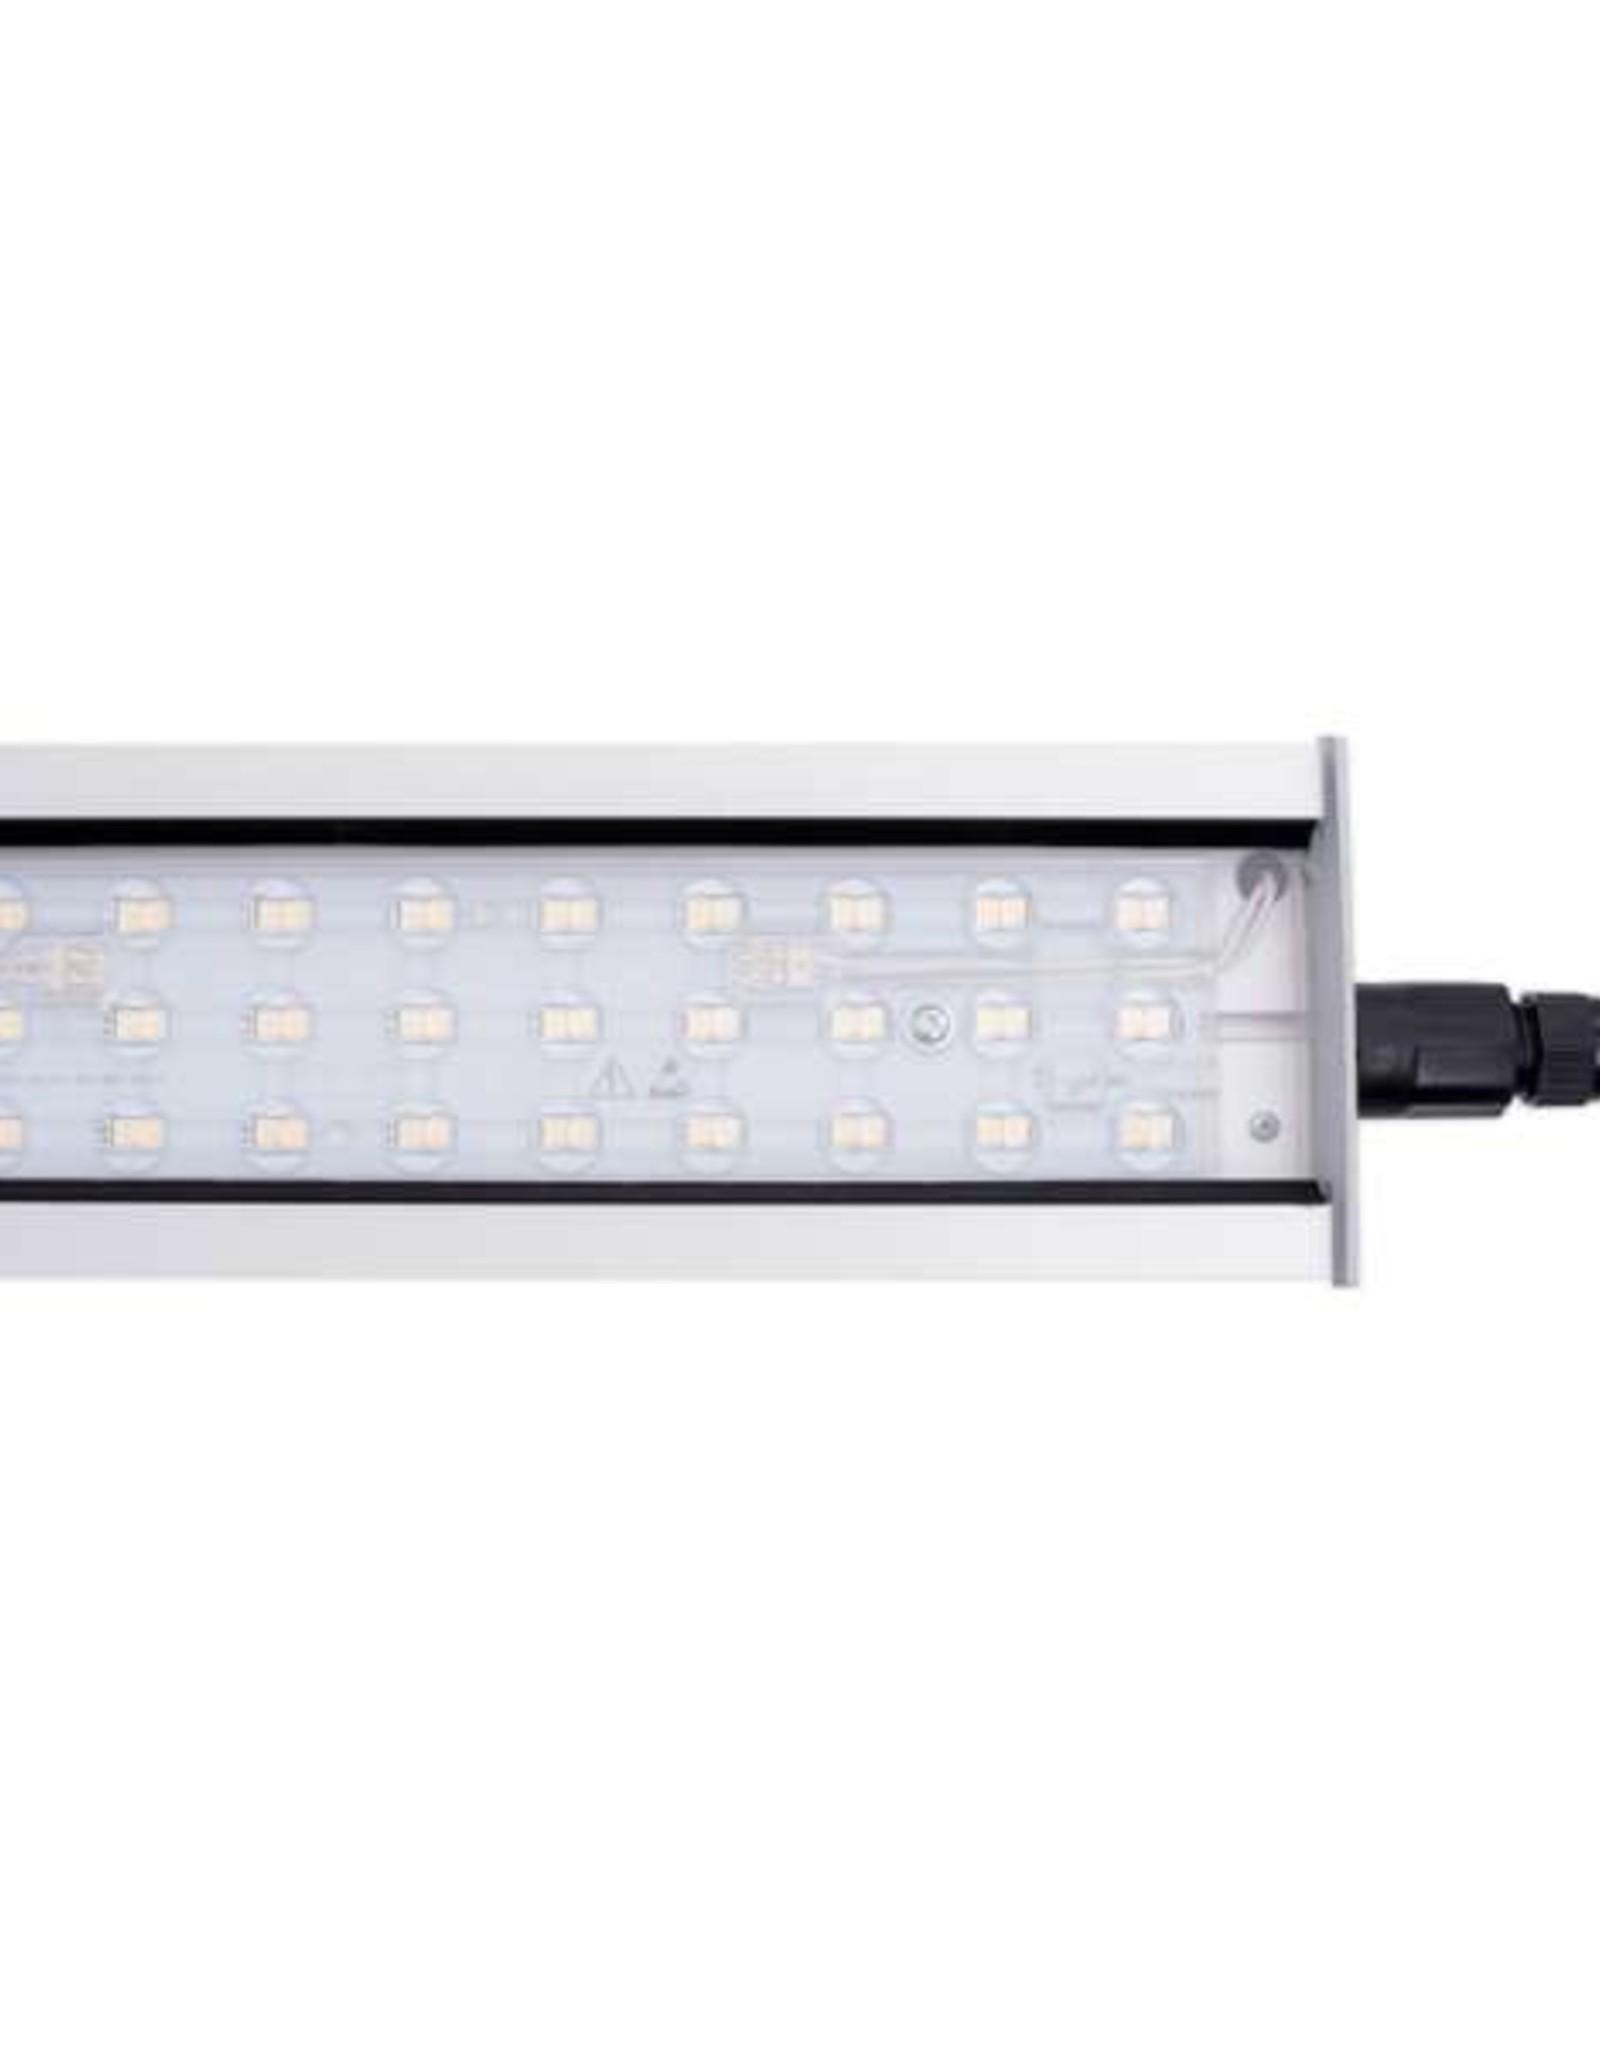 LUXON LED ULTIMA:LED 2.0 I